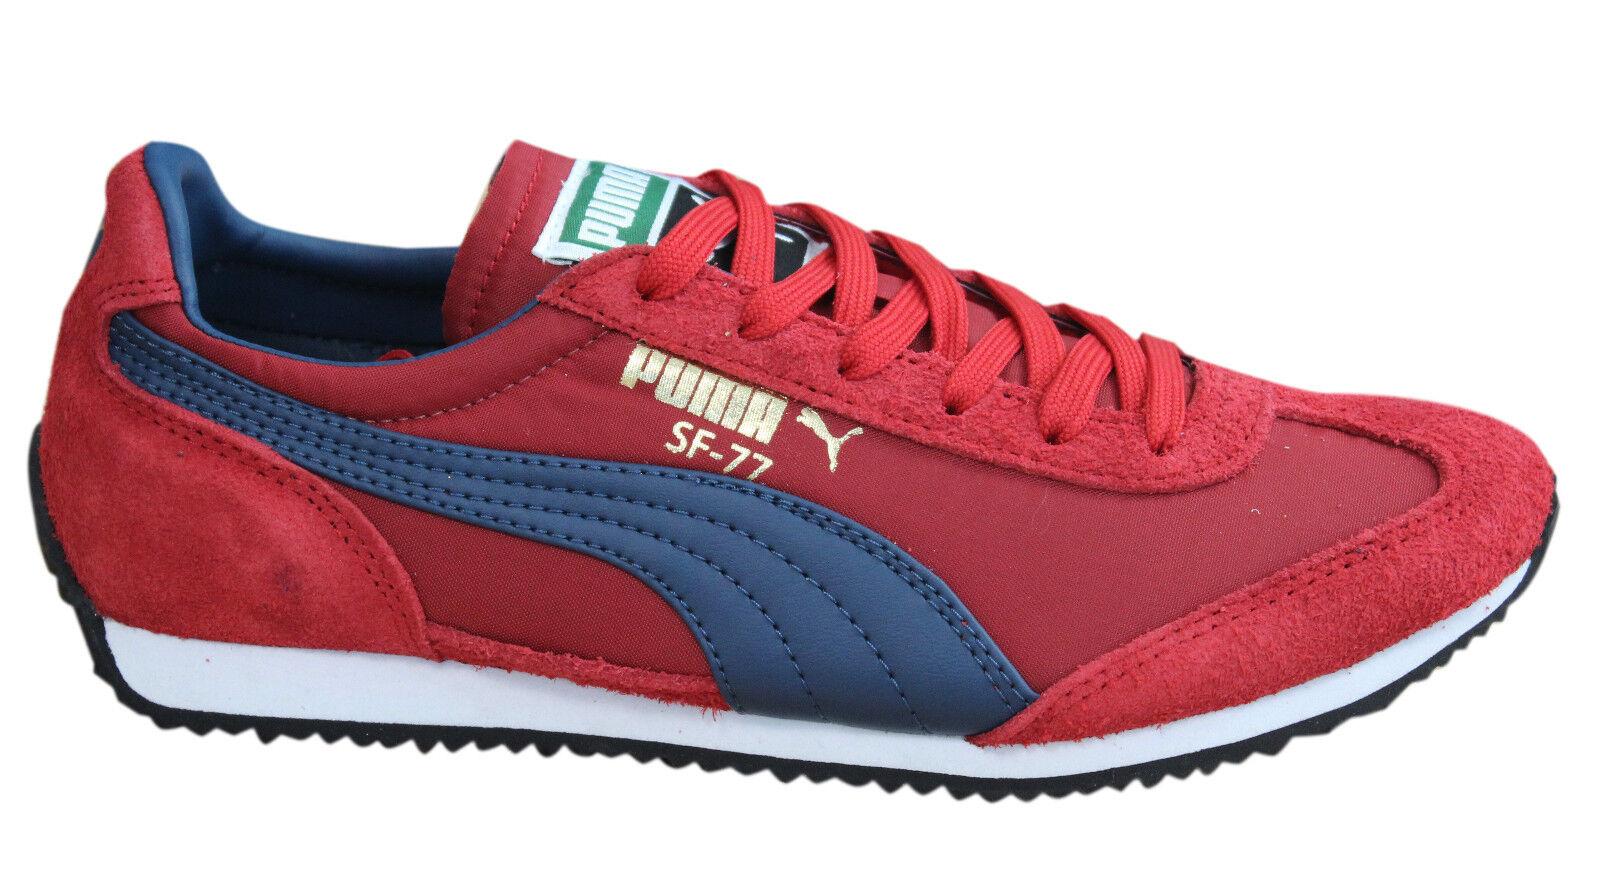 Puma Leder SF77 HERREN TURNSCHUHE SCHNÜRSCHUHE Rot Blau Leder Puma Textil 354656 08 D94 b94bd9